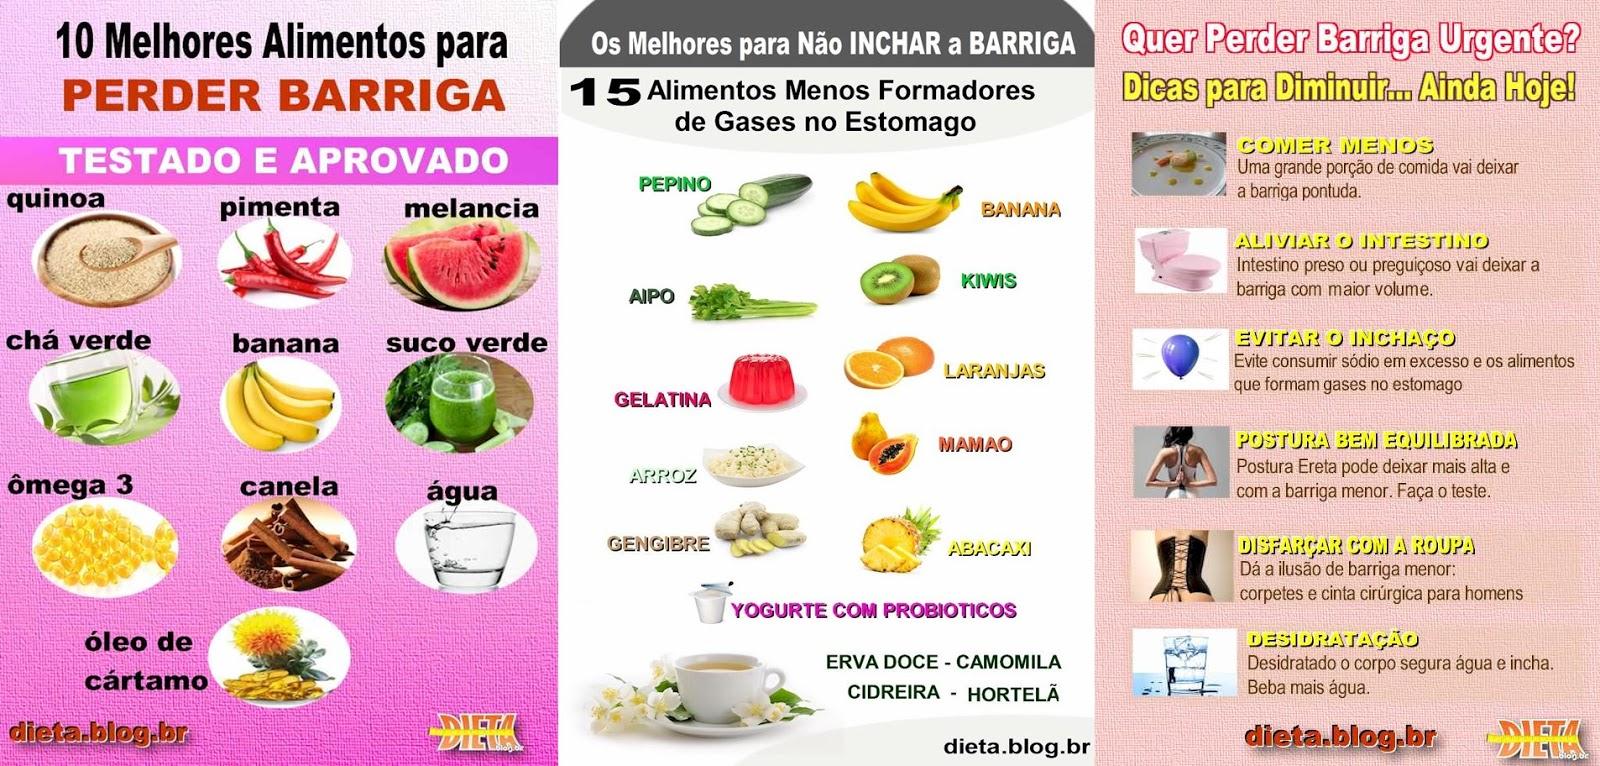 alimentos para dieta perder barriga